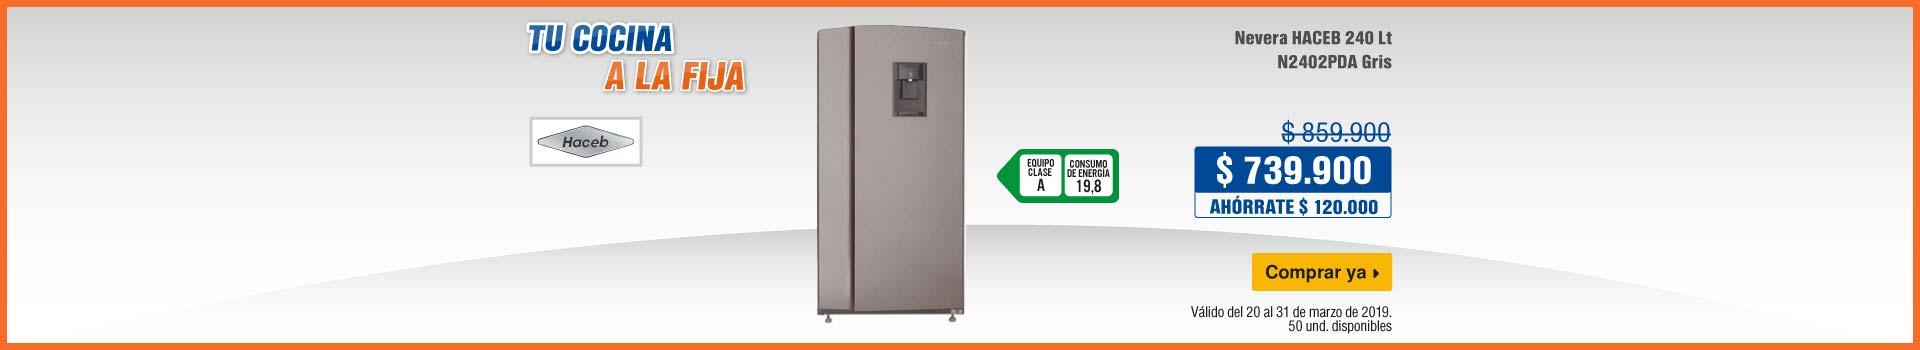 AK-KT-mayores-3-ELECT-BCAT-refrigeracion-haceb-200319